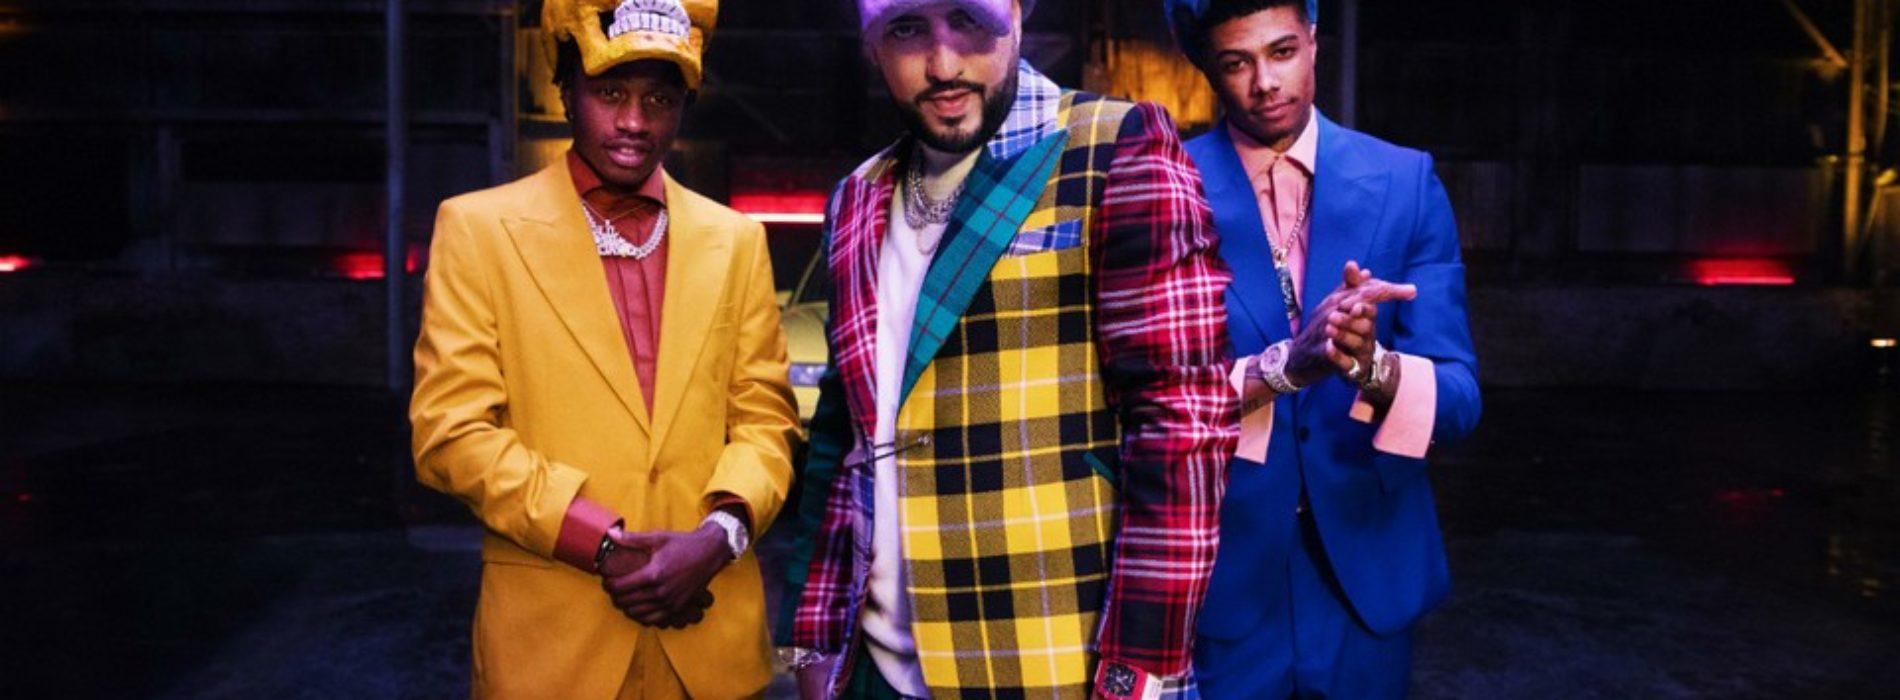 French Montana – Slide ft. Blueface, Lil Tjay – Avril 2019